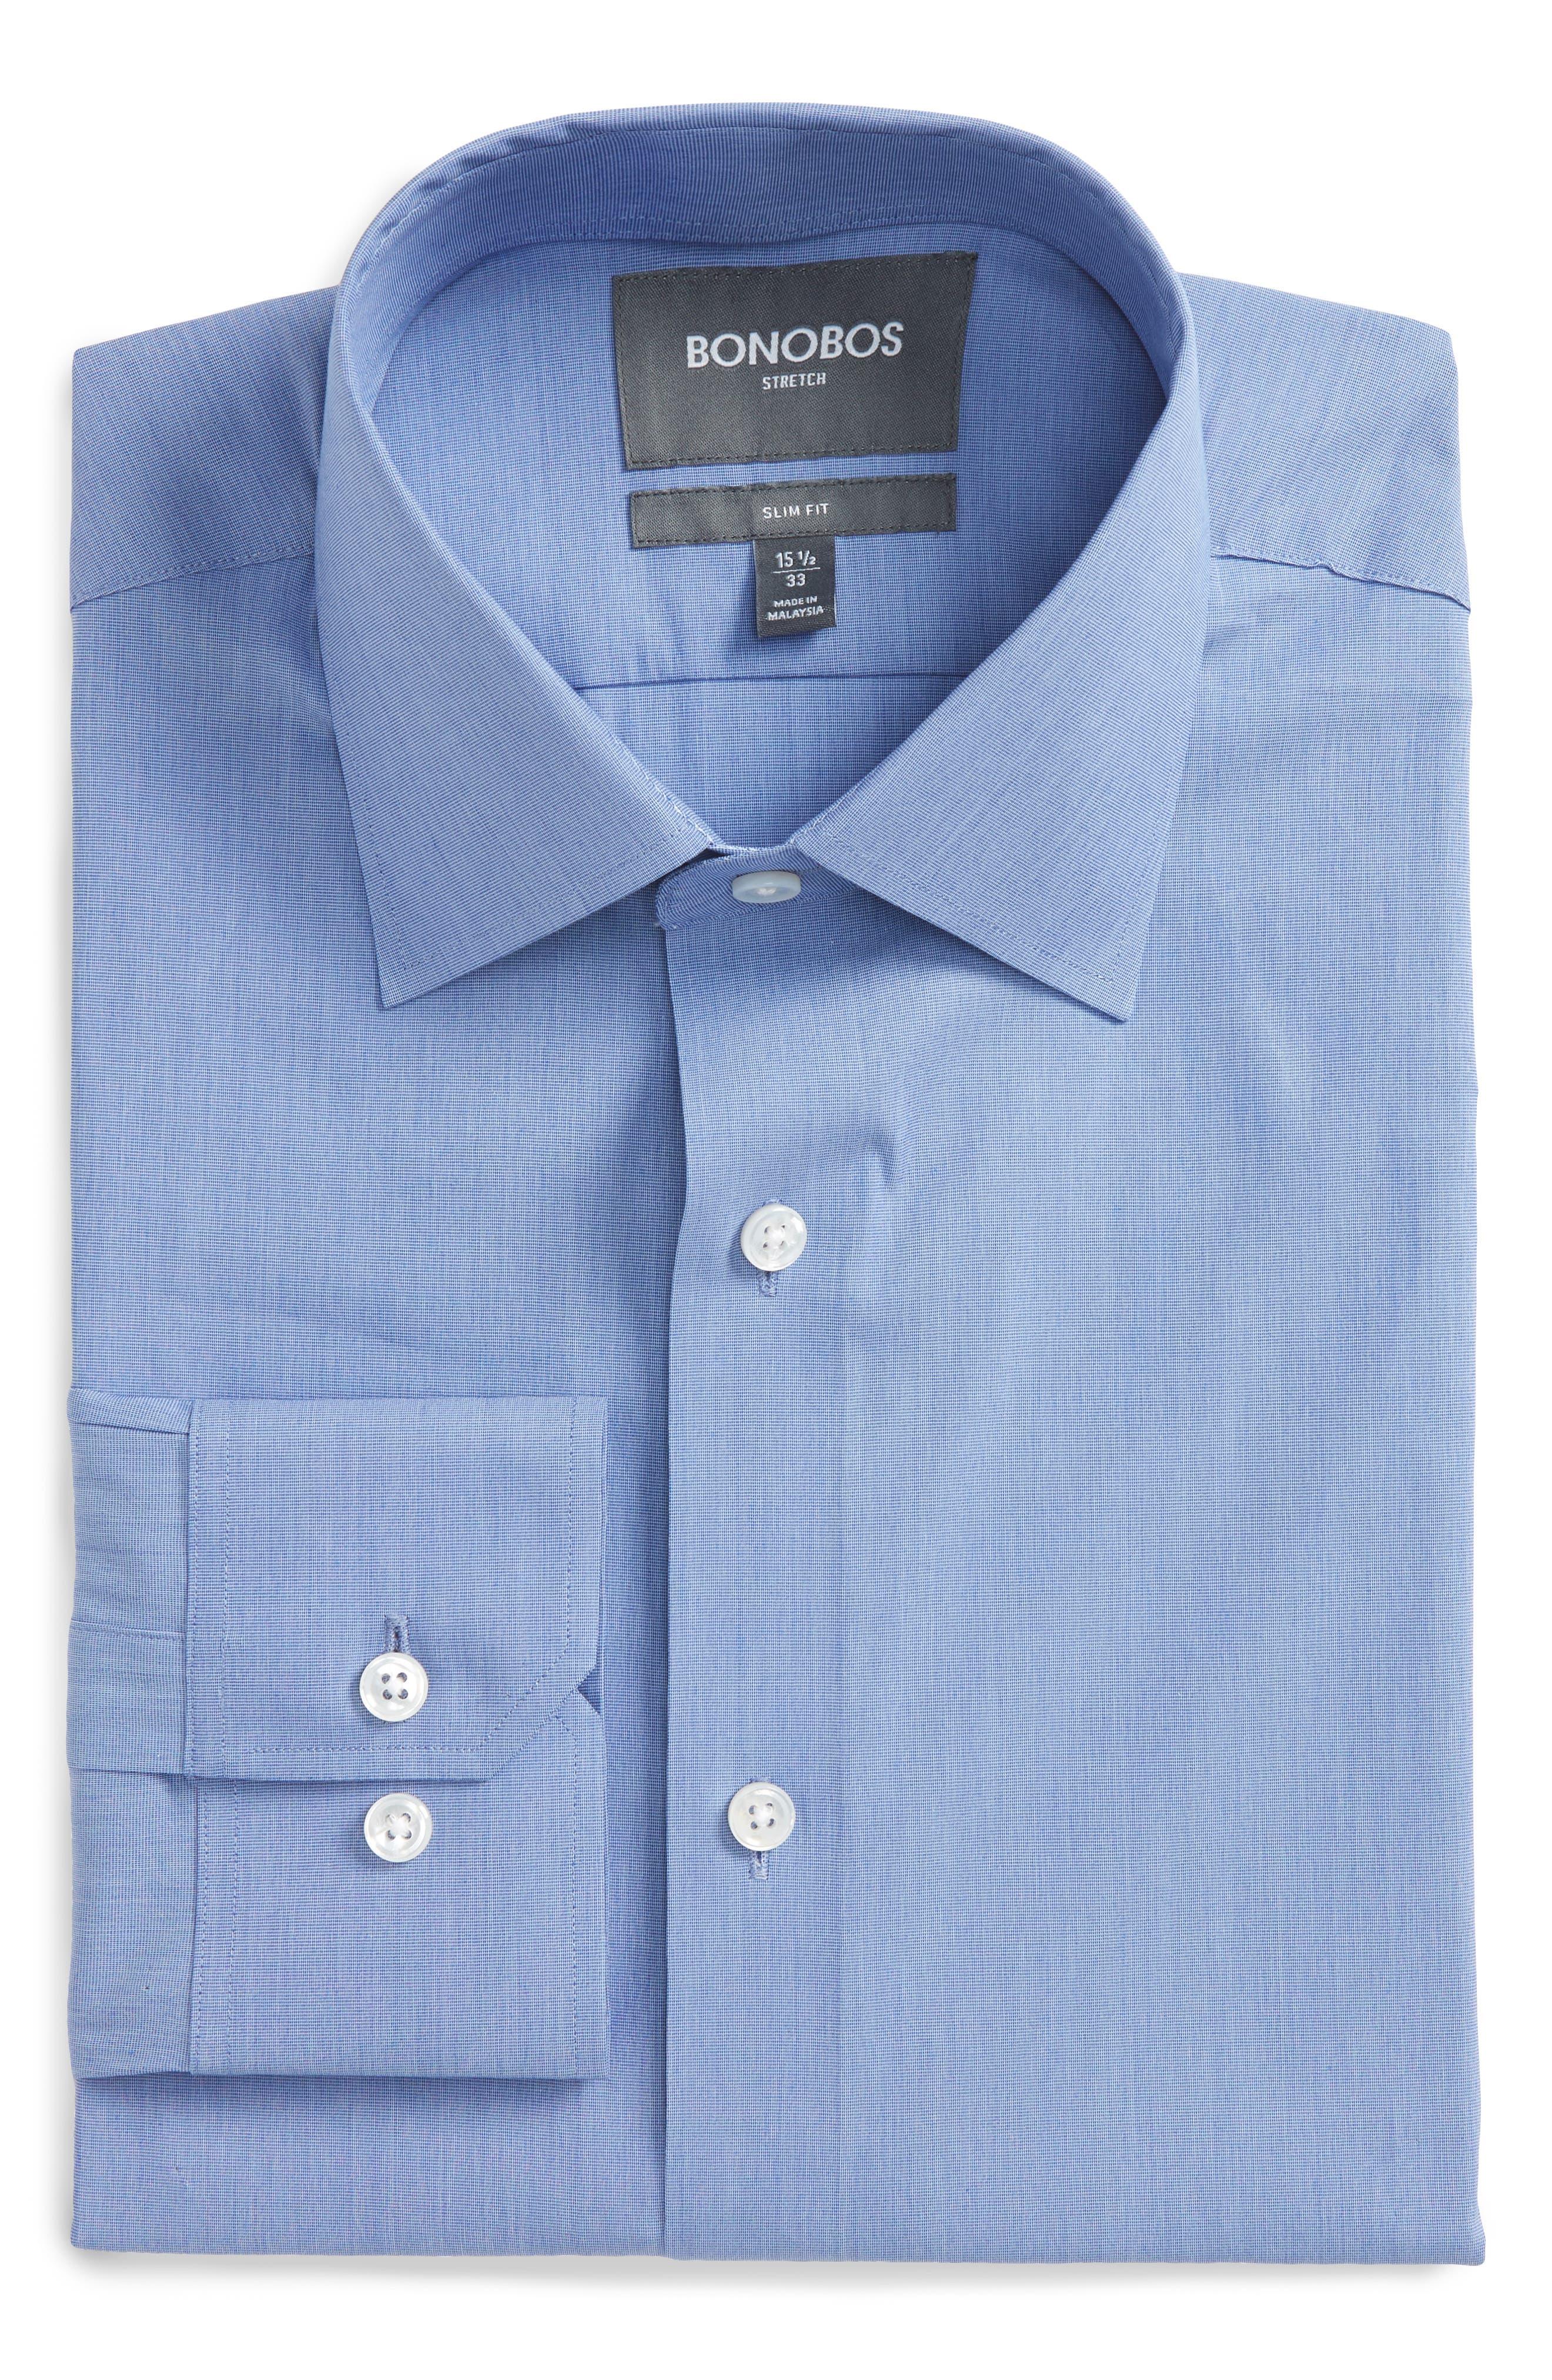 Alternate Image 1 Selected - Bonobos Jetsetter Slim Fit Solid Dress Shirt